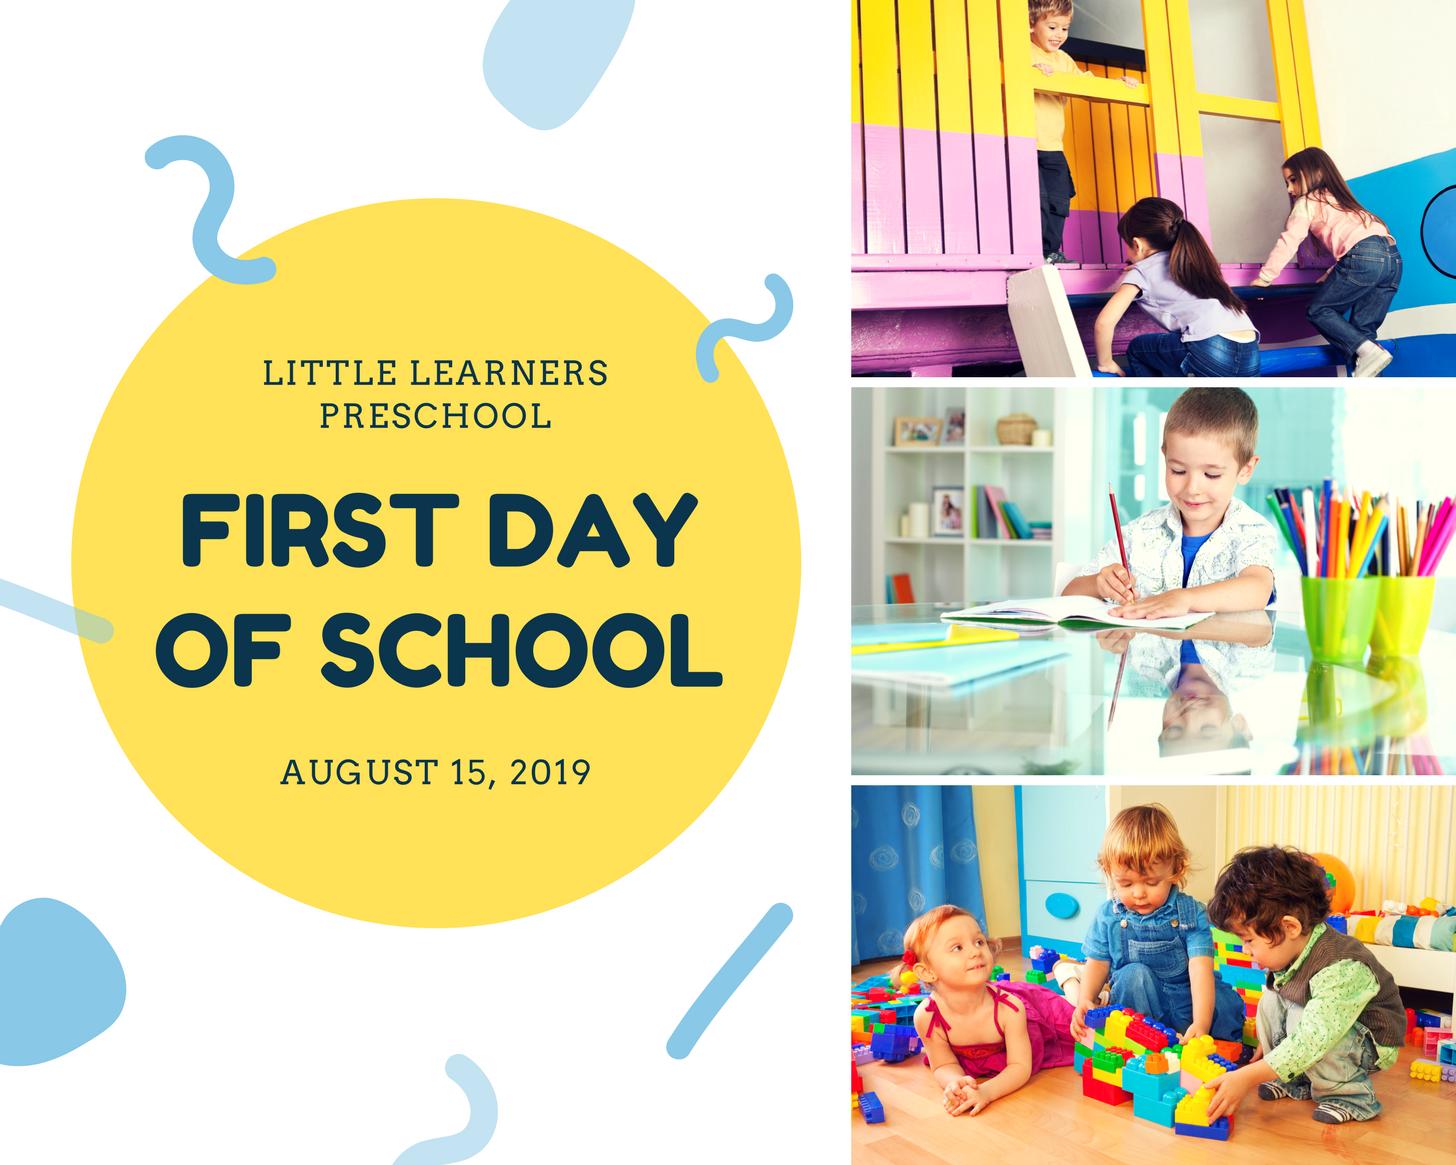 Yellow Preschool Photo Collage